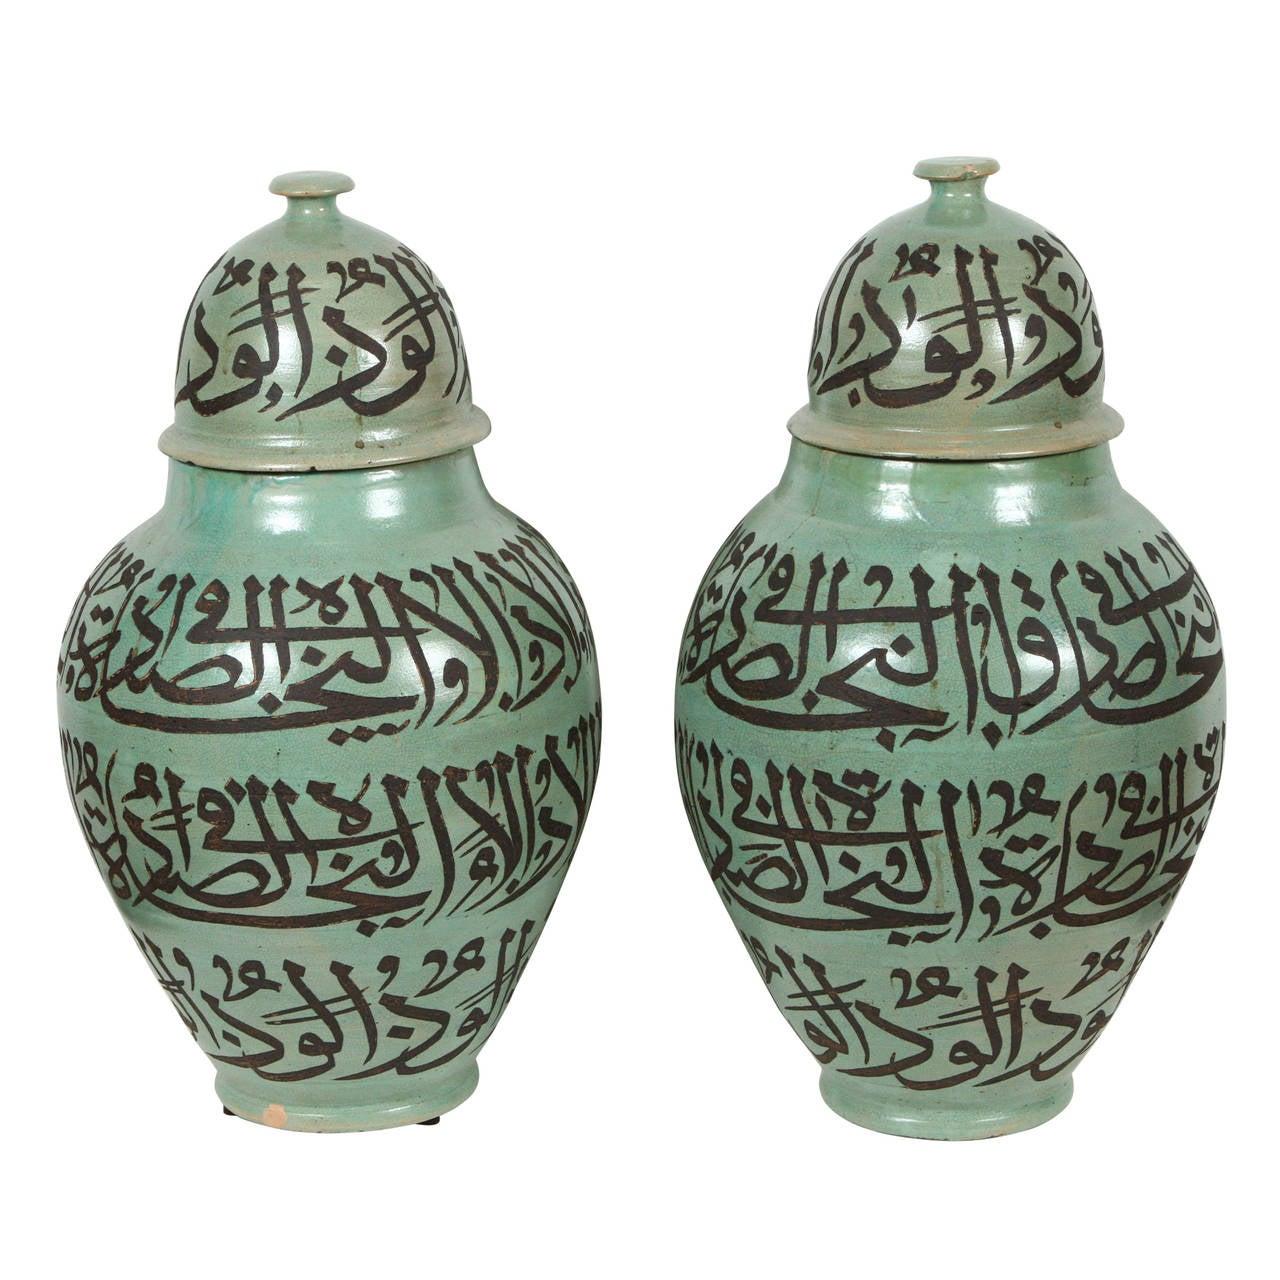 Green moorish ceramic urns with chiseled arabic calligraphy green moorish ceramic urns with chiseled arabic calligraphy writing for sale reviewsmspy